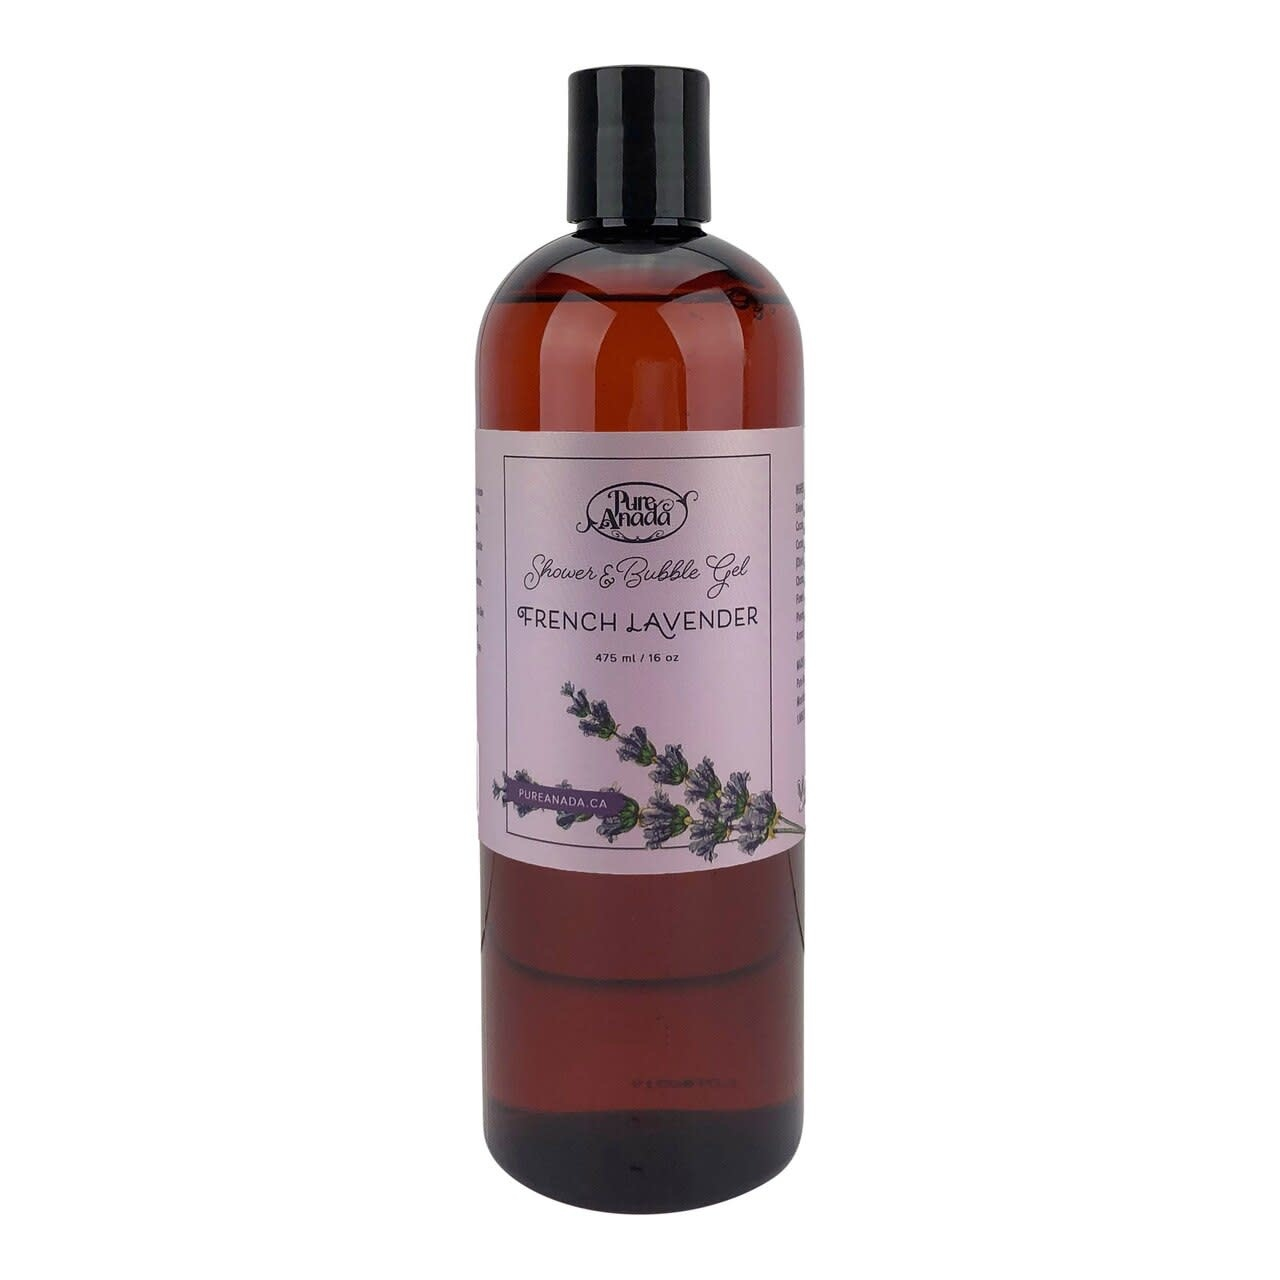 Shower & Bubble Gel - French Lavender-1